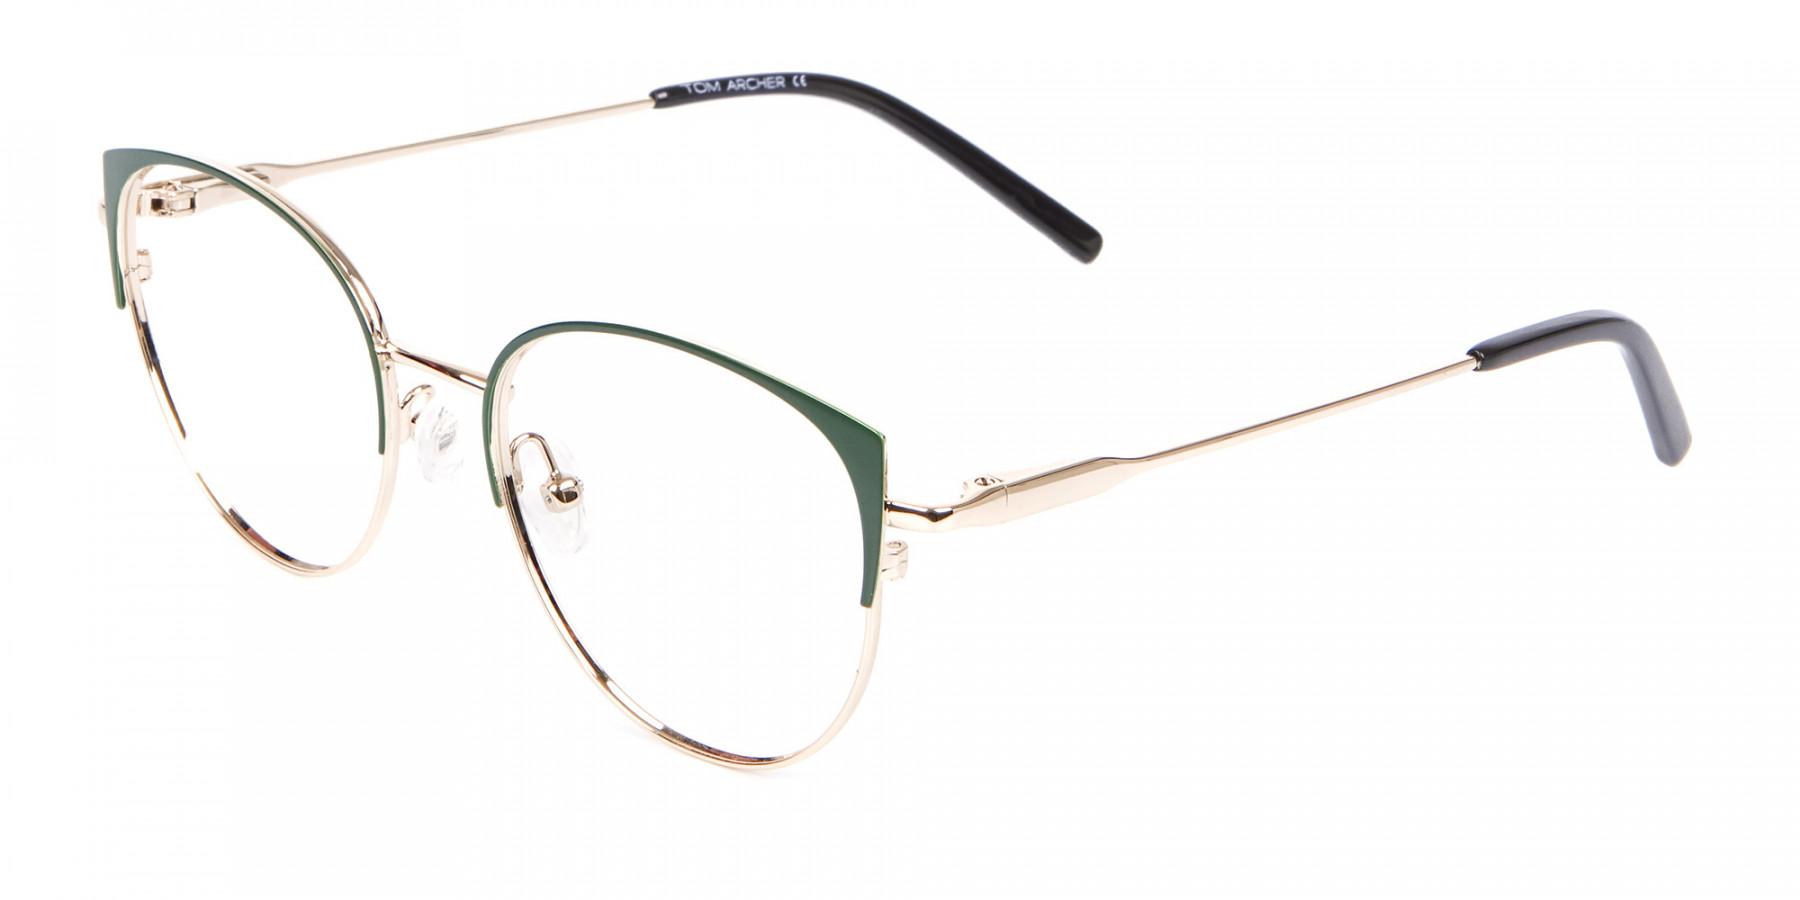 Vintage Inspired Glasses Green and Metal Frame - 1